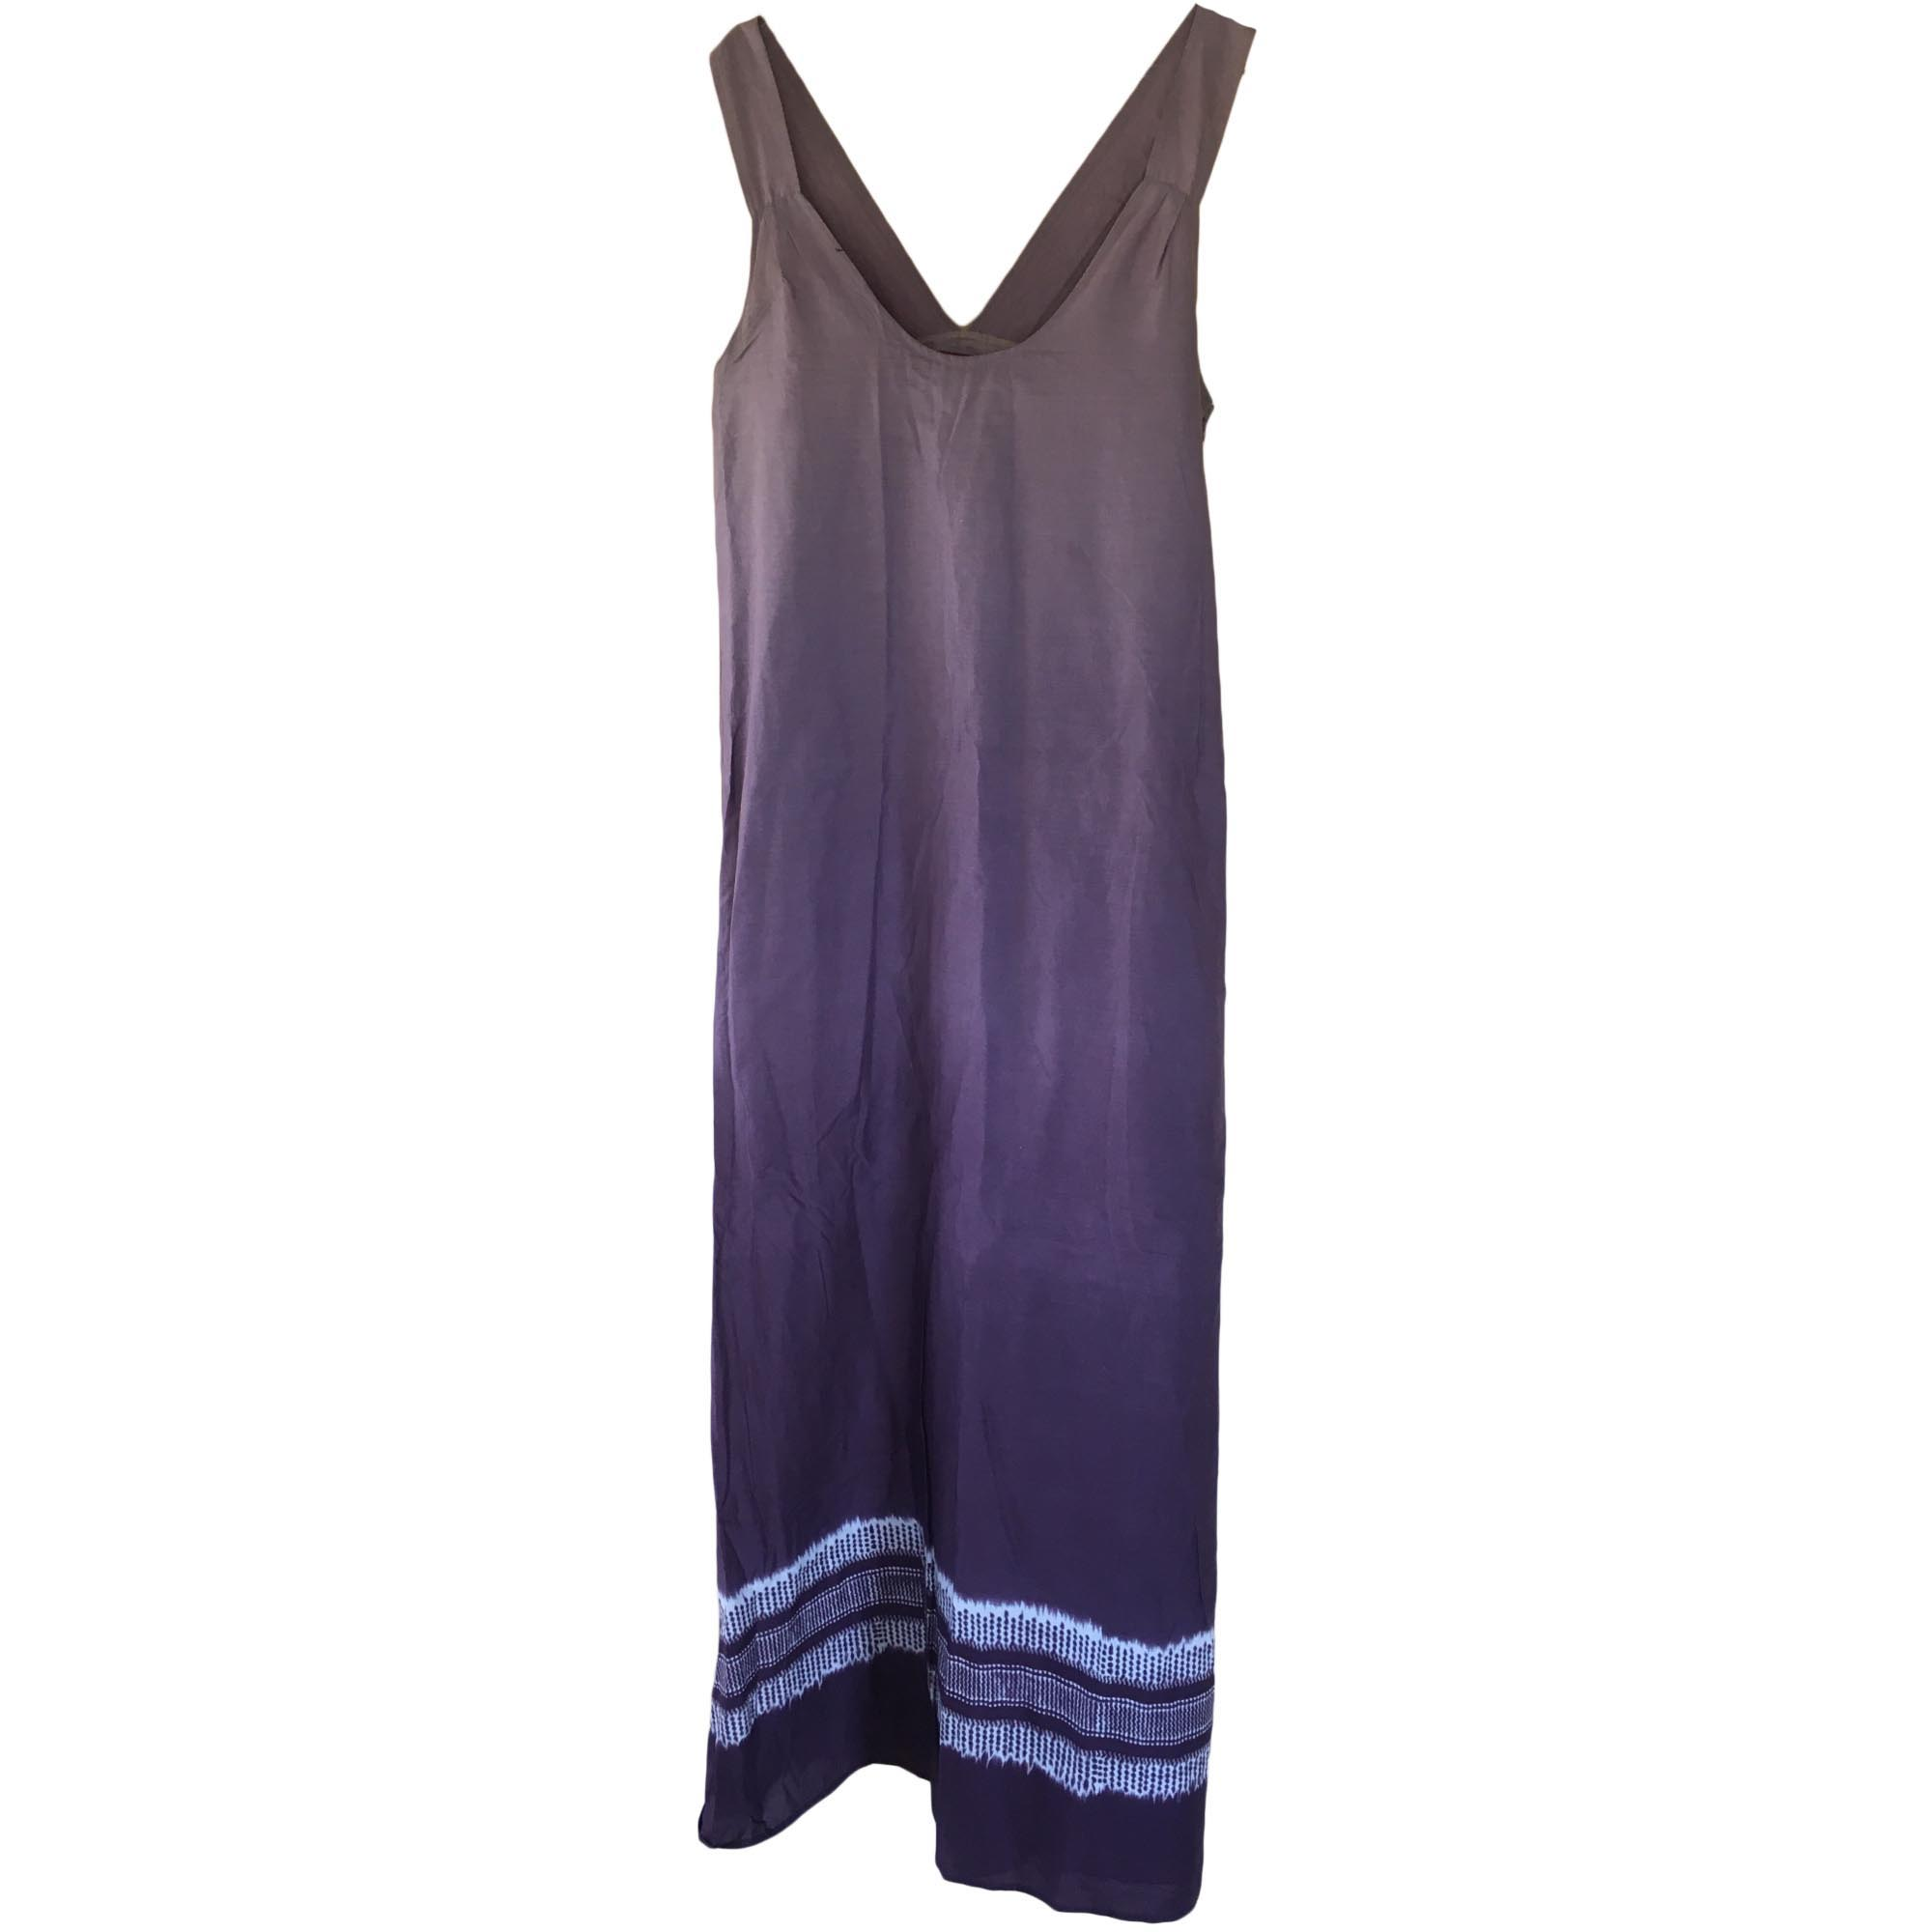 Robe longue comptoir des cotonniers 42 l xl t4 violet - Robe longue comptoir des cotonniers ...